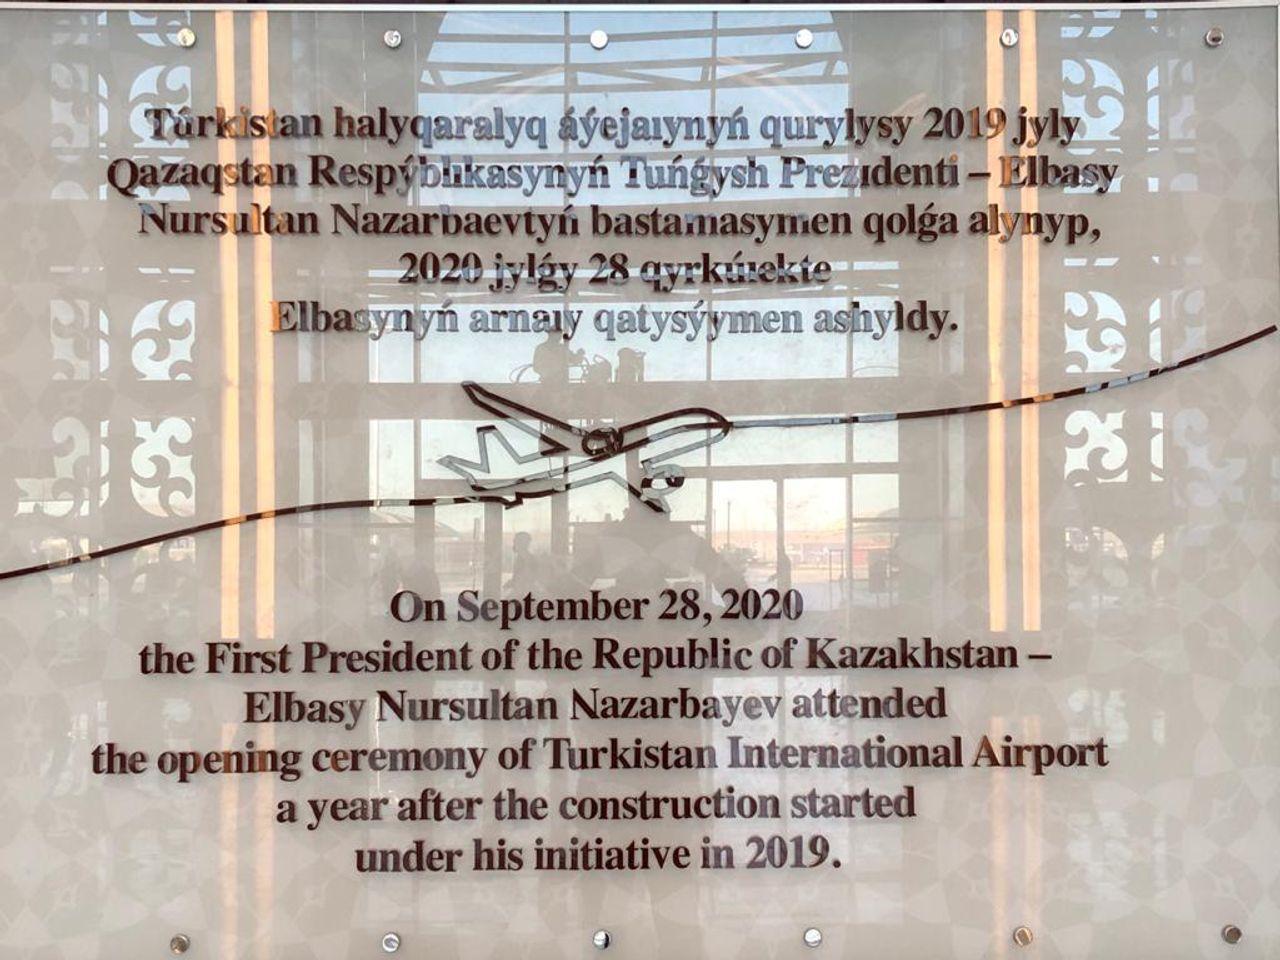 Аэропорт Туркестана получил сертификат годности аэродрома- Kapital.kz